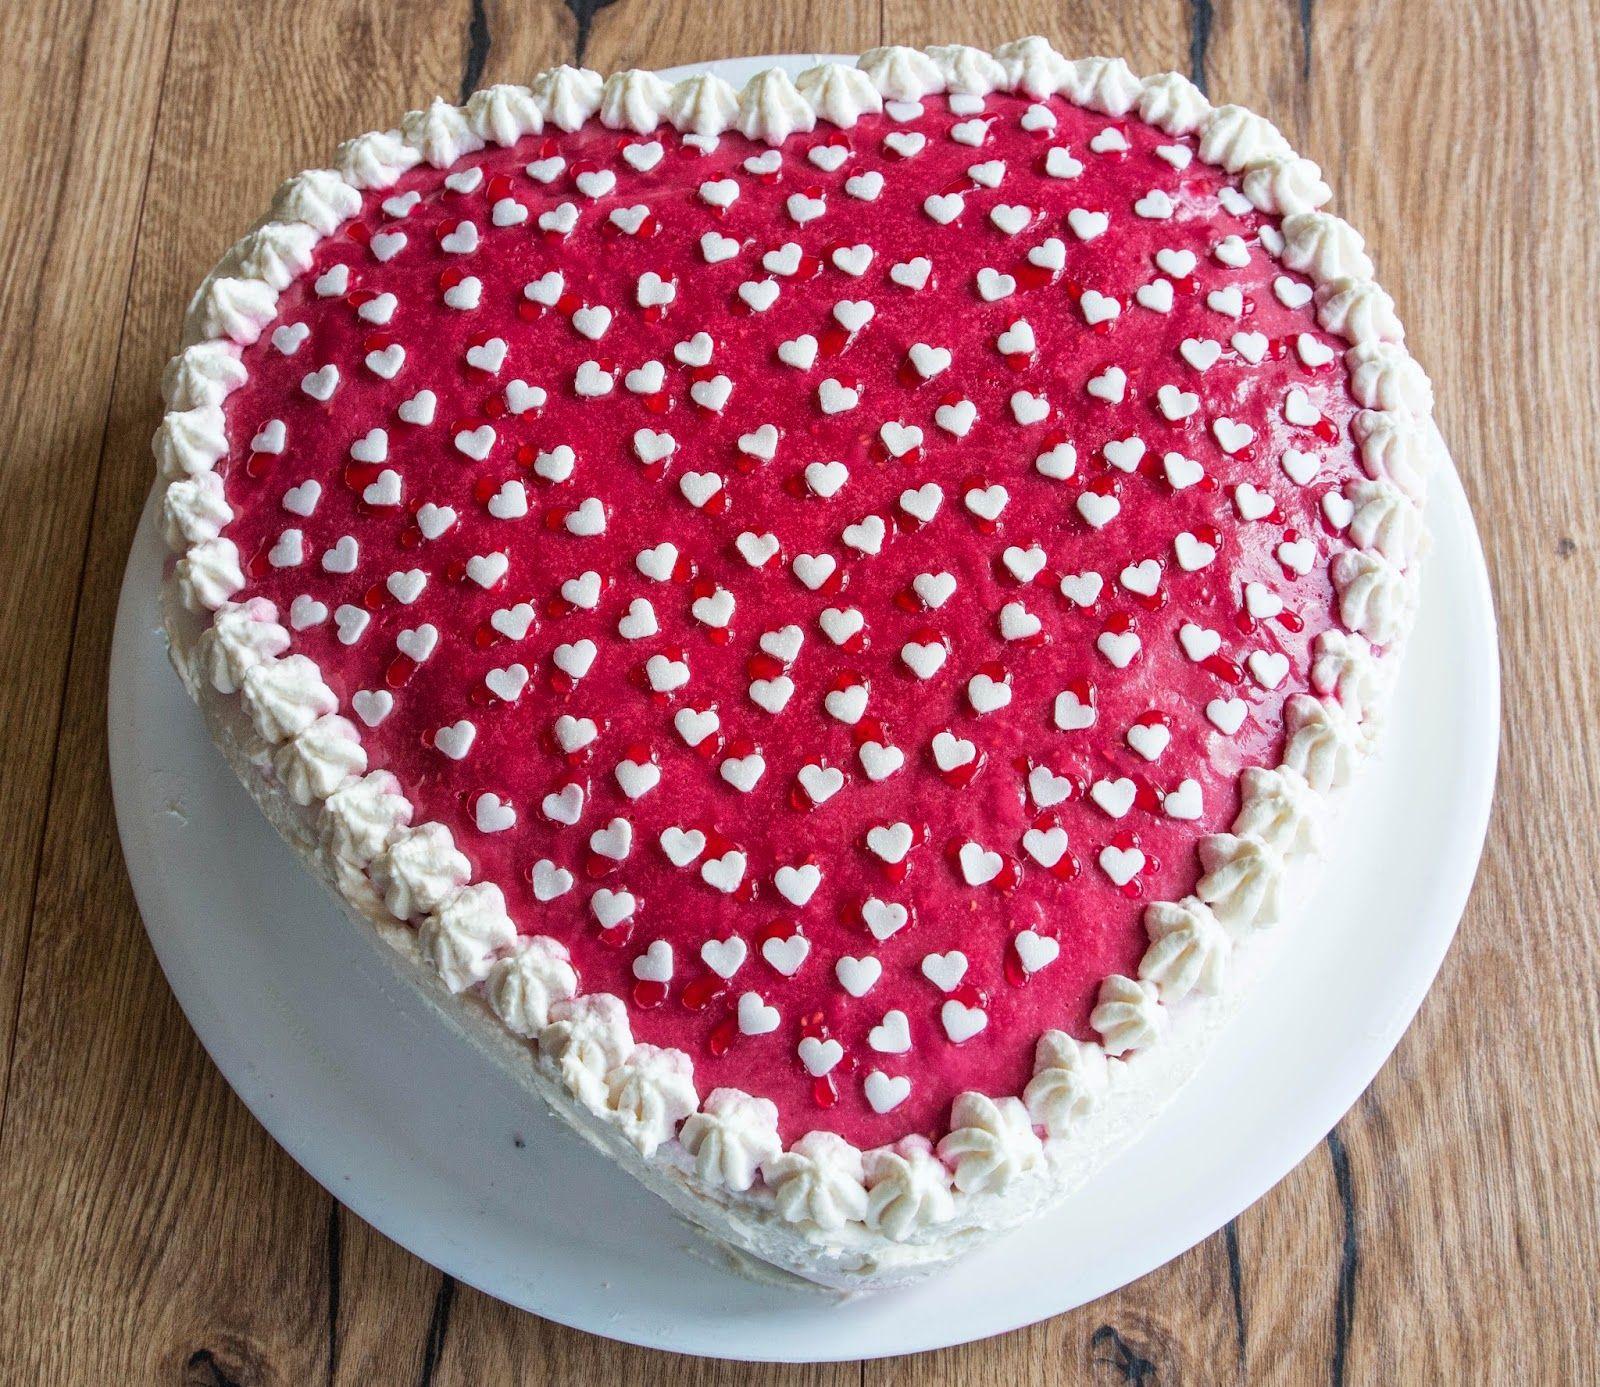 Chefkoch valentinstag torte